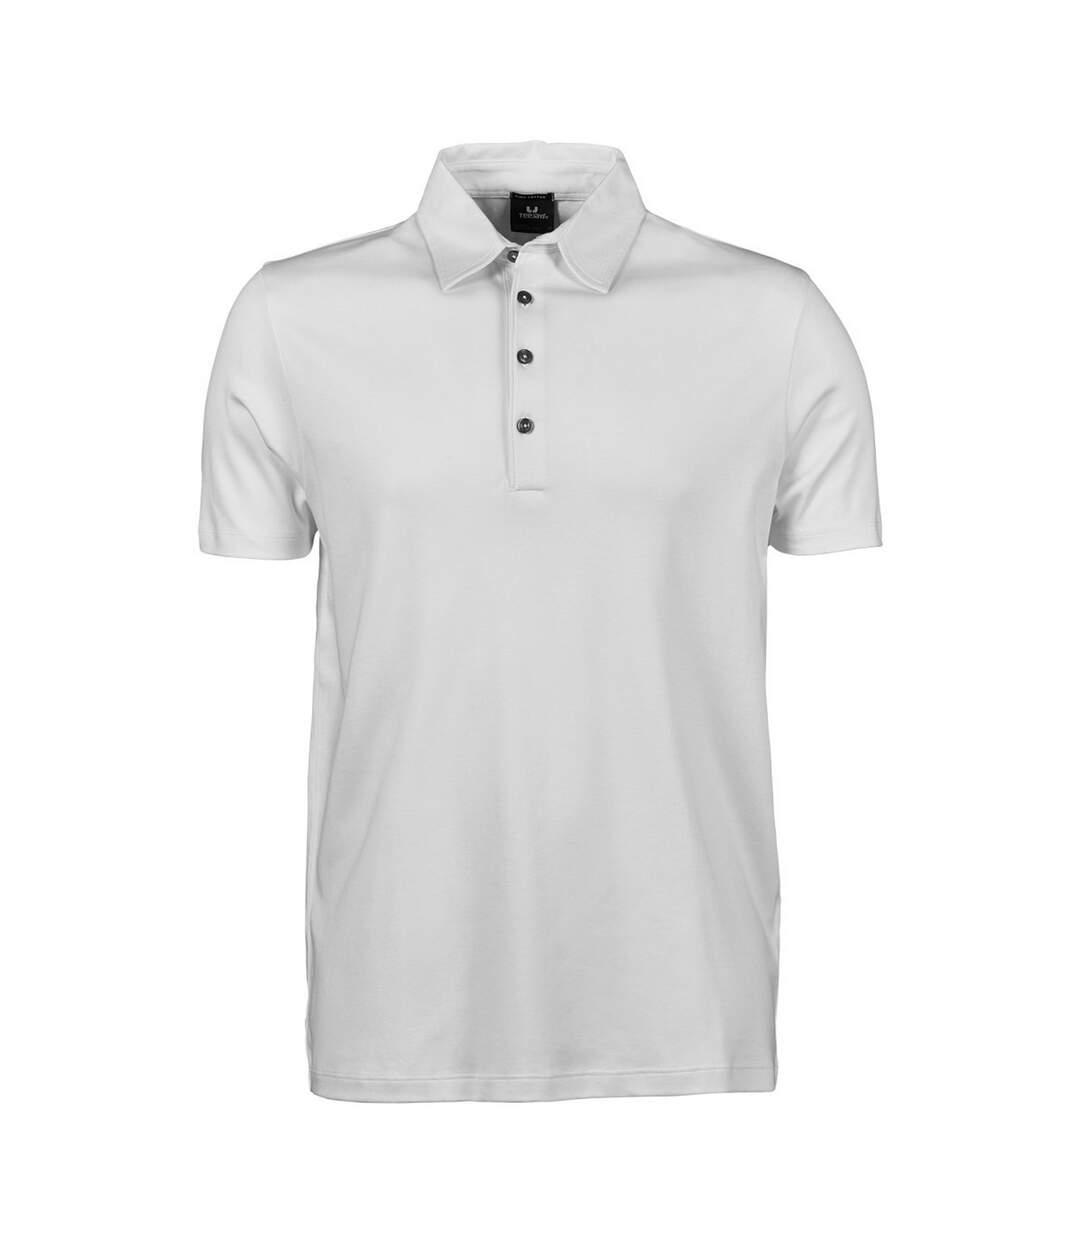 Tee Jays Mens Pima Short Sleeve Cotton Polo Shirt (Black) - UTBC3812